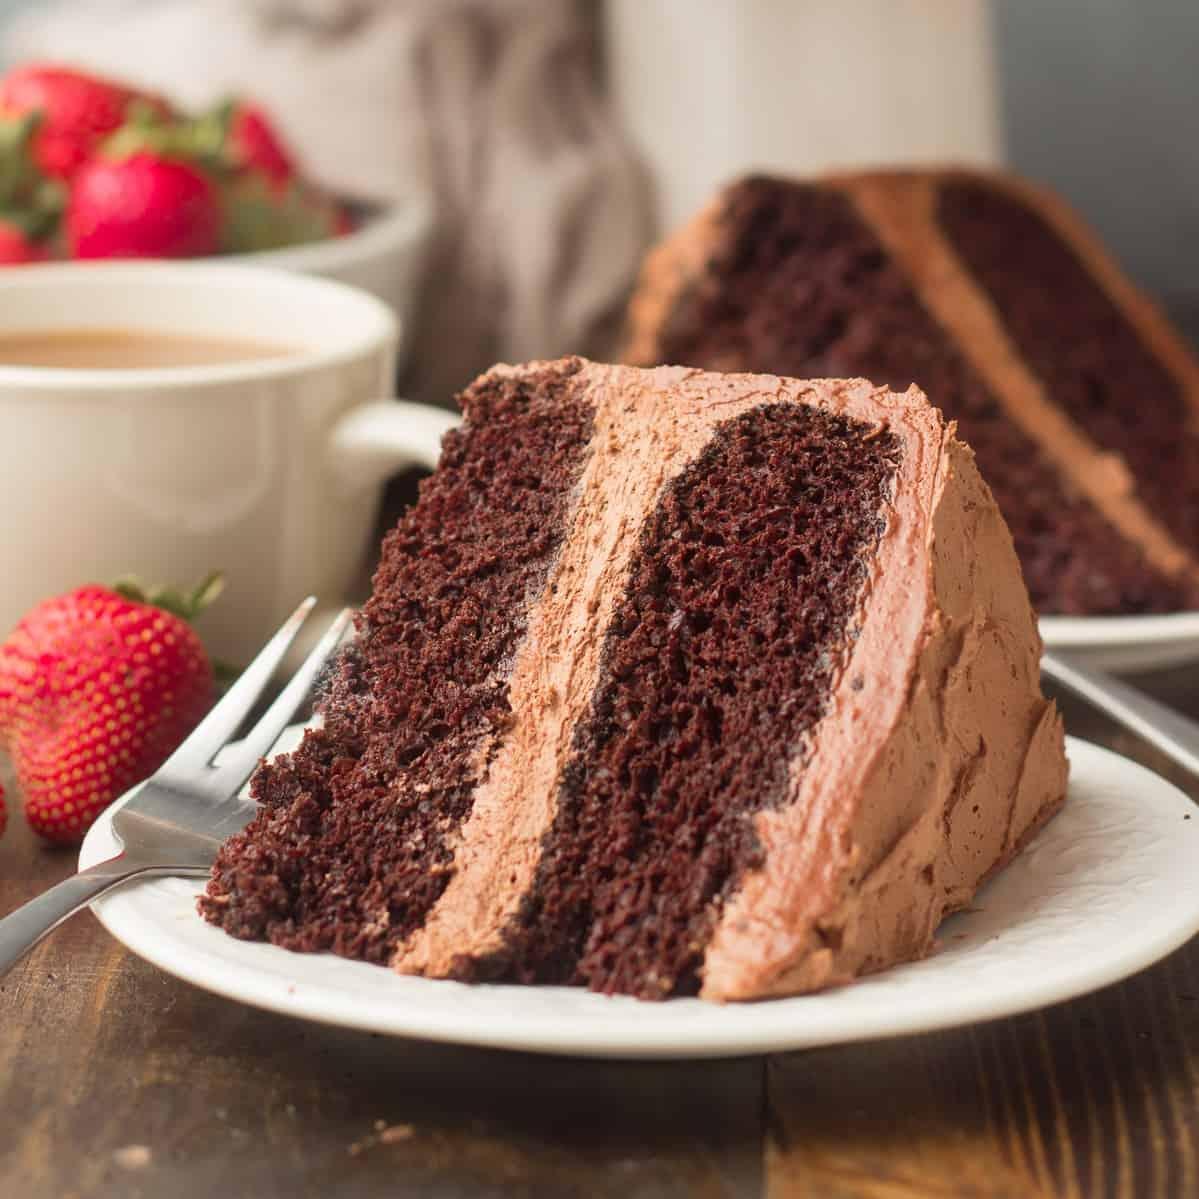 Slice of Vegan Chocolate Cake on a plate